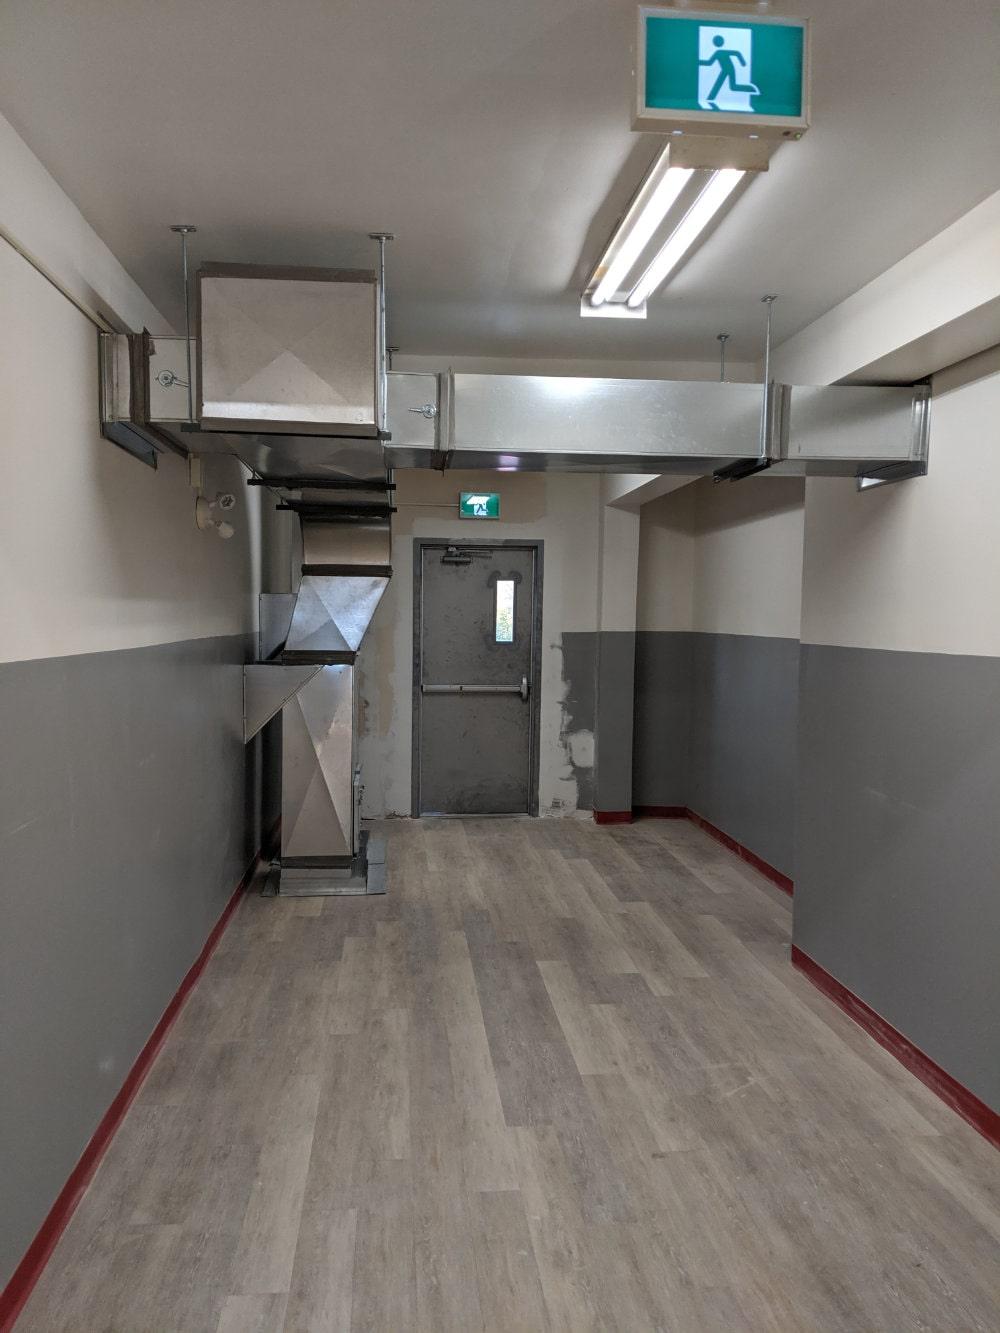 building interior under renovation